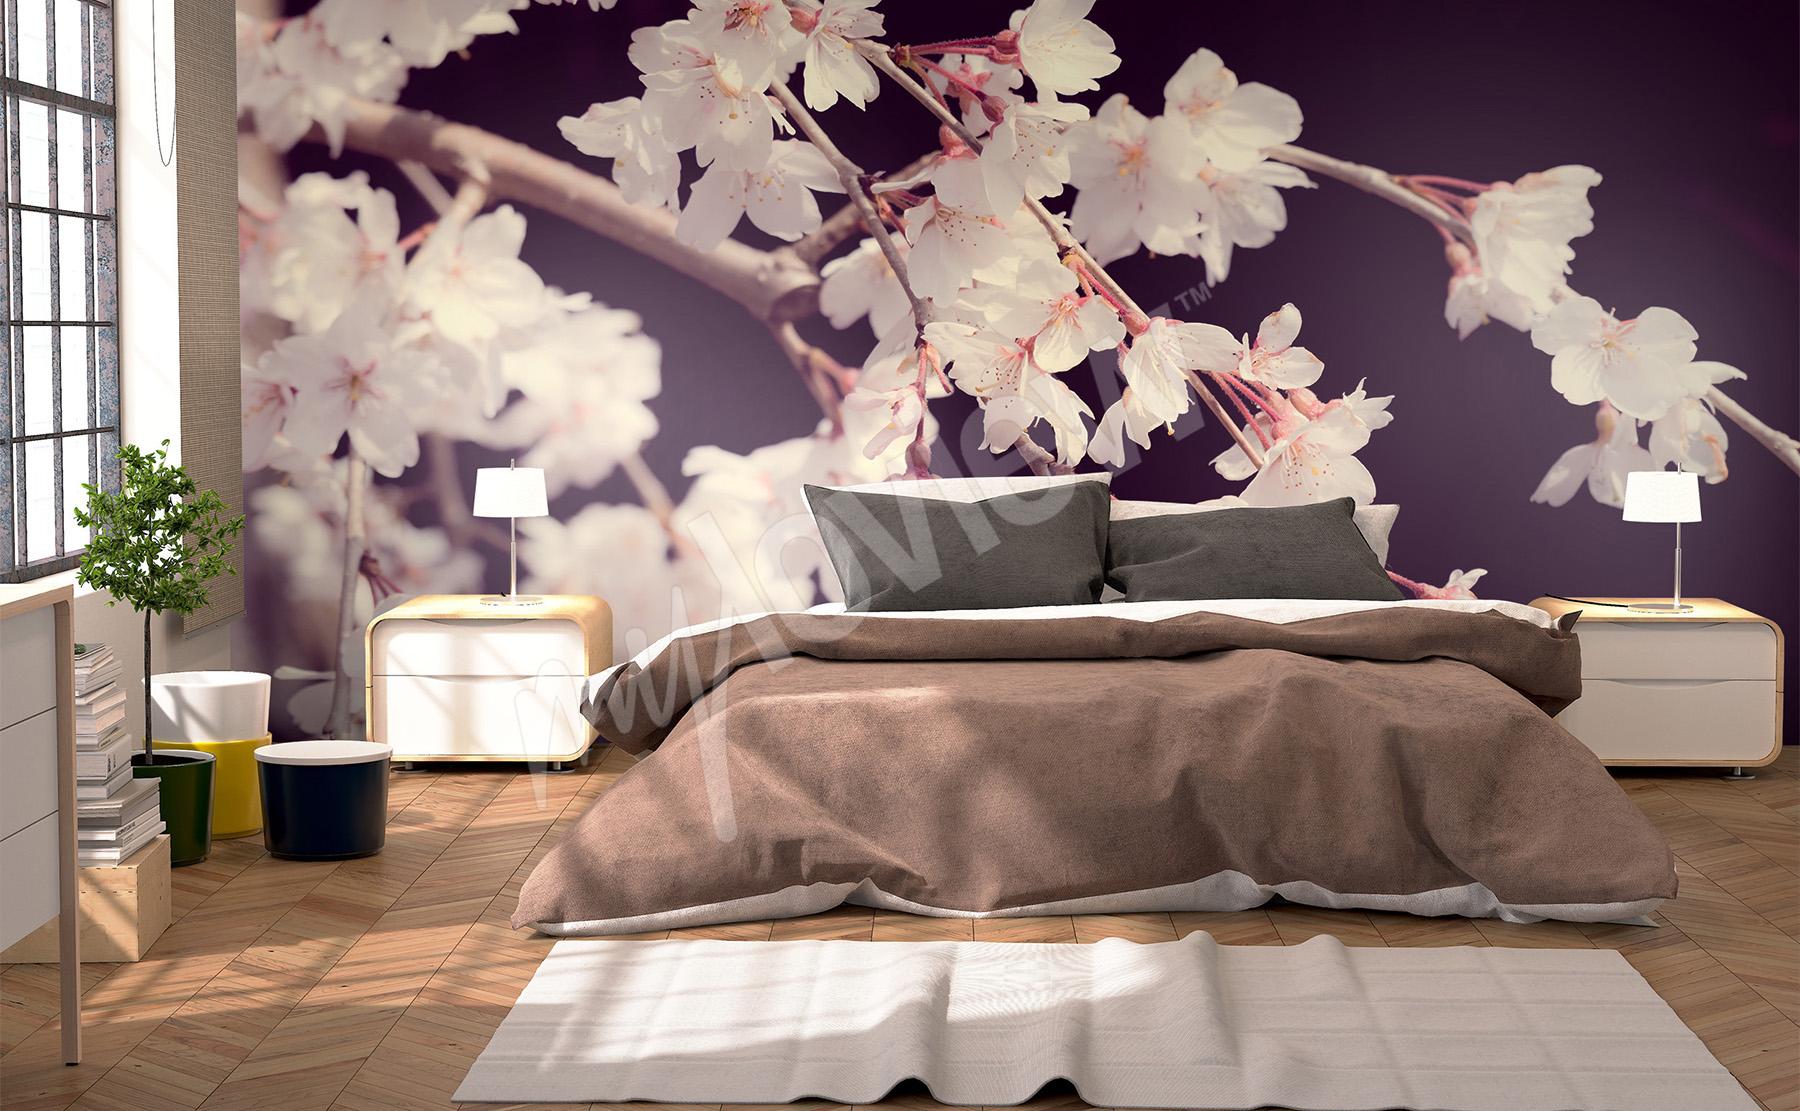 Fototapeten Schlafzimmer Grosse Der Wand Myloview De